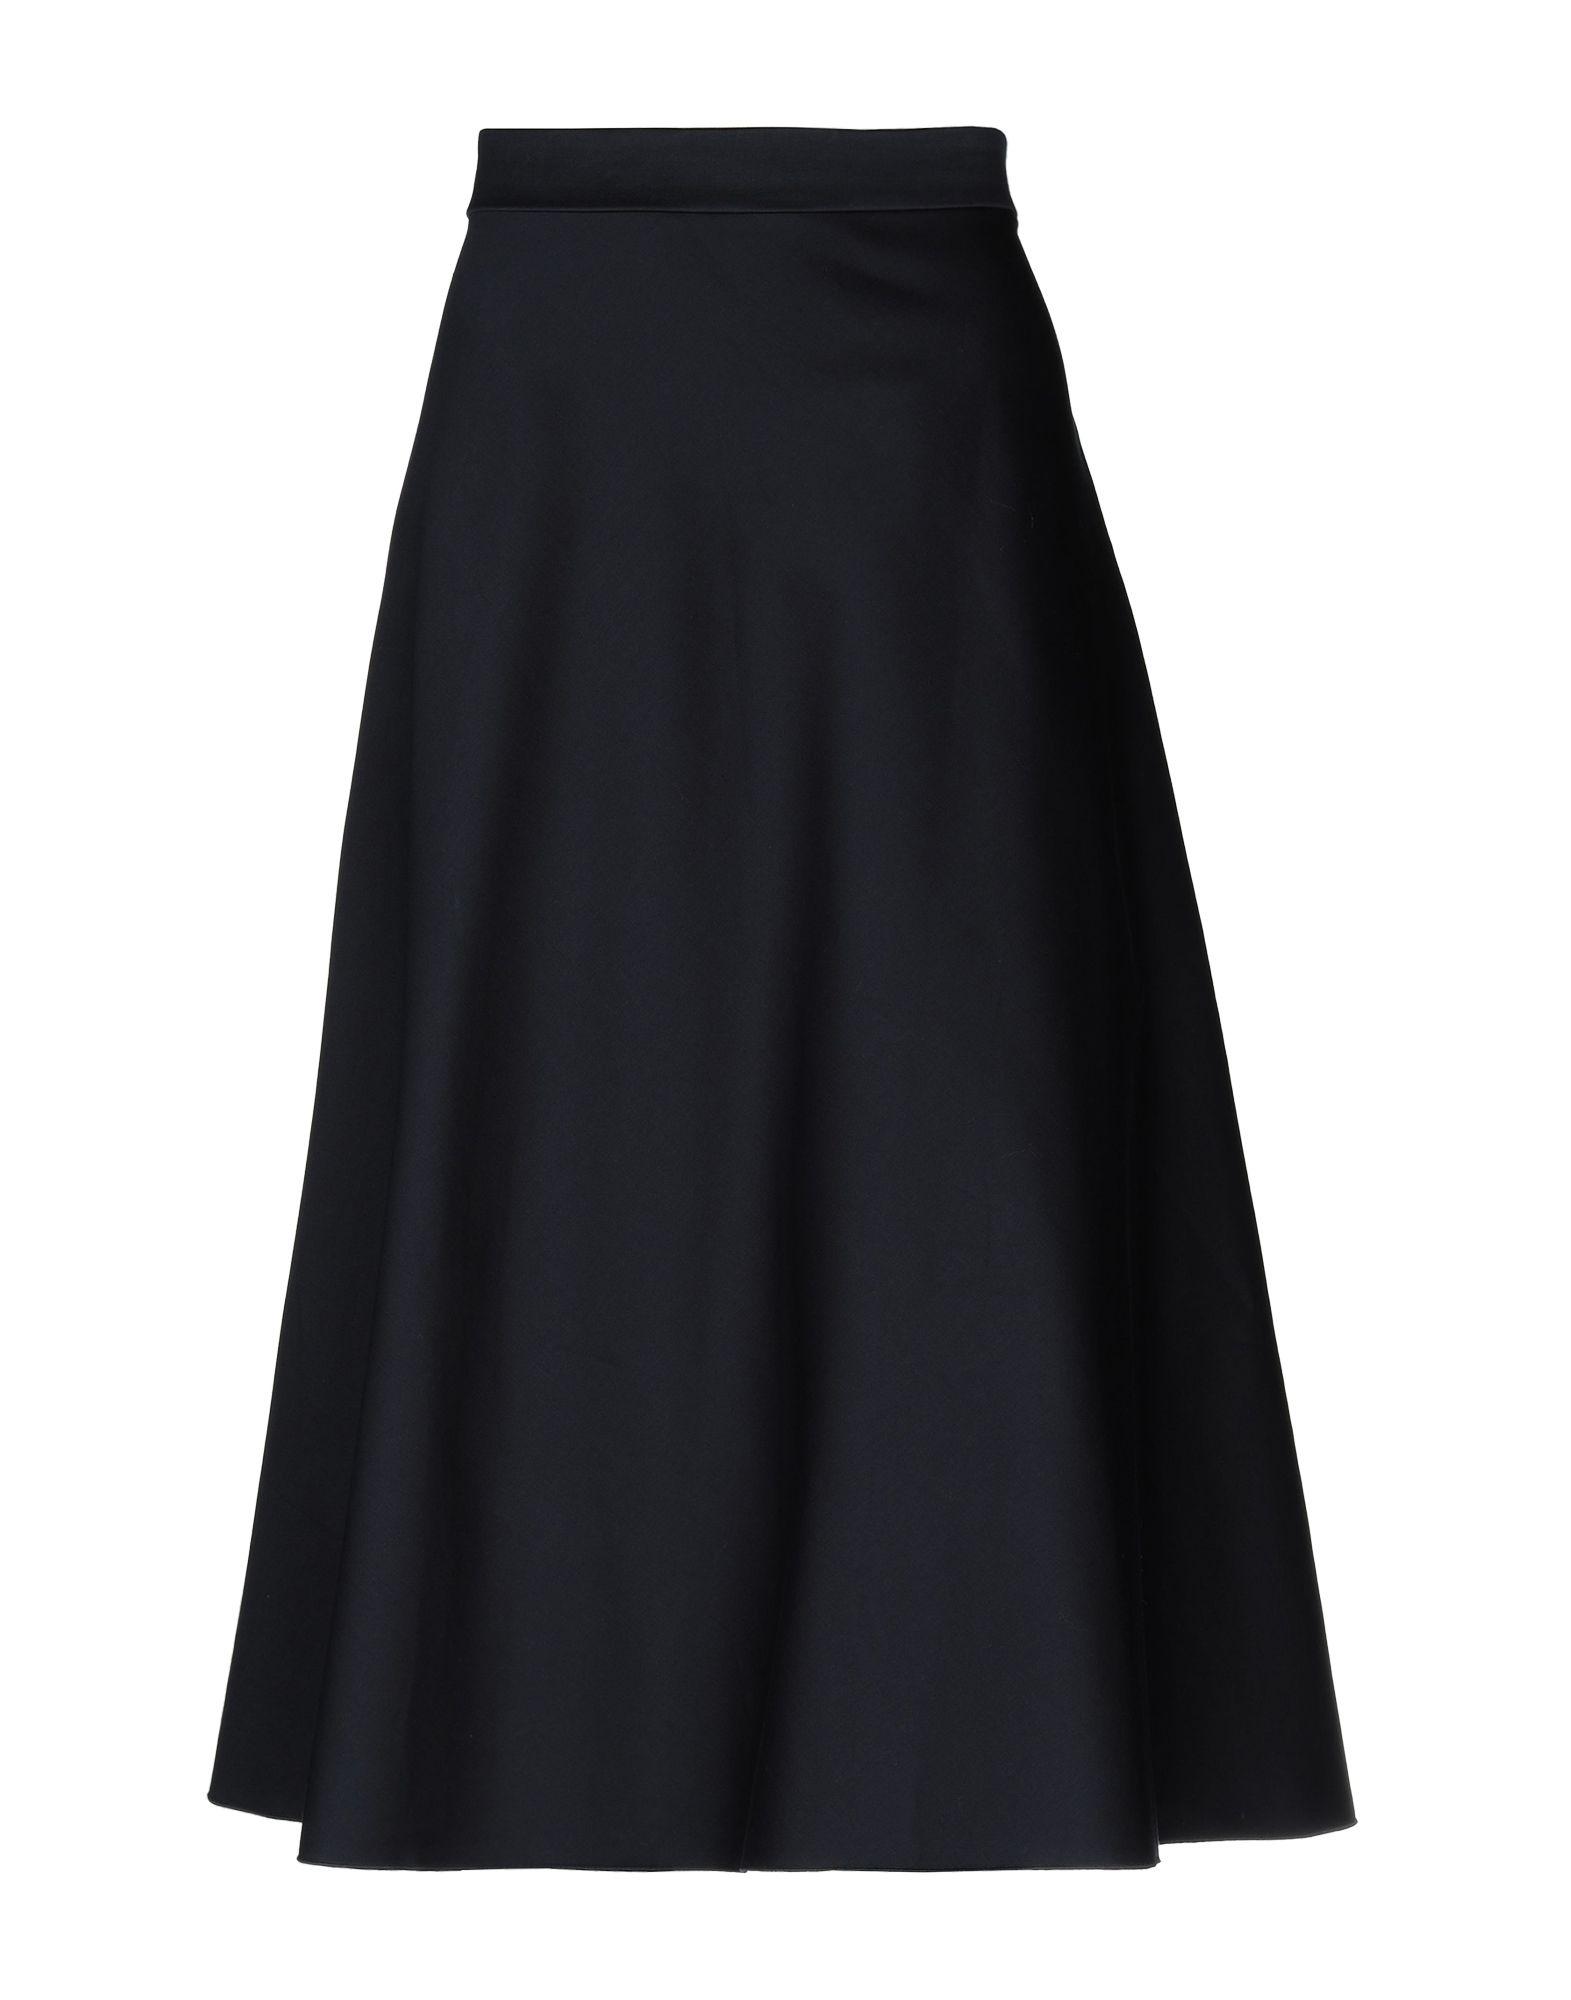 'S MAX MARA Юбка длиной 3/4 юбка s cool юбка